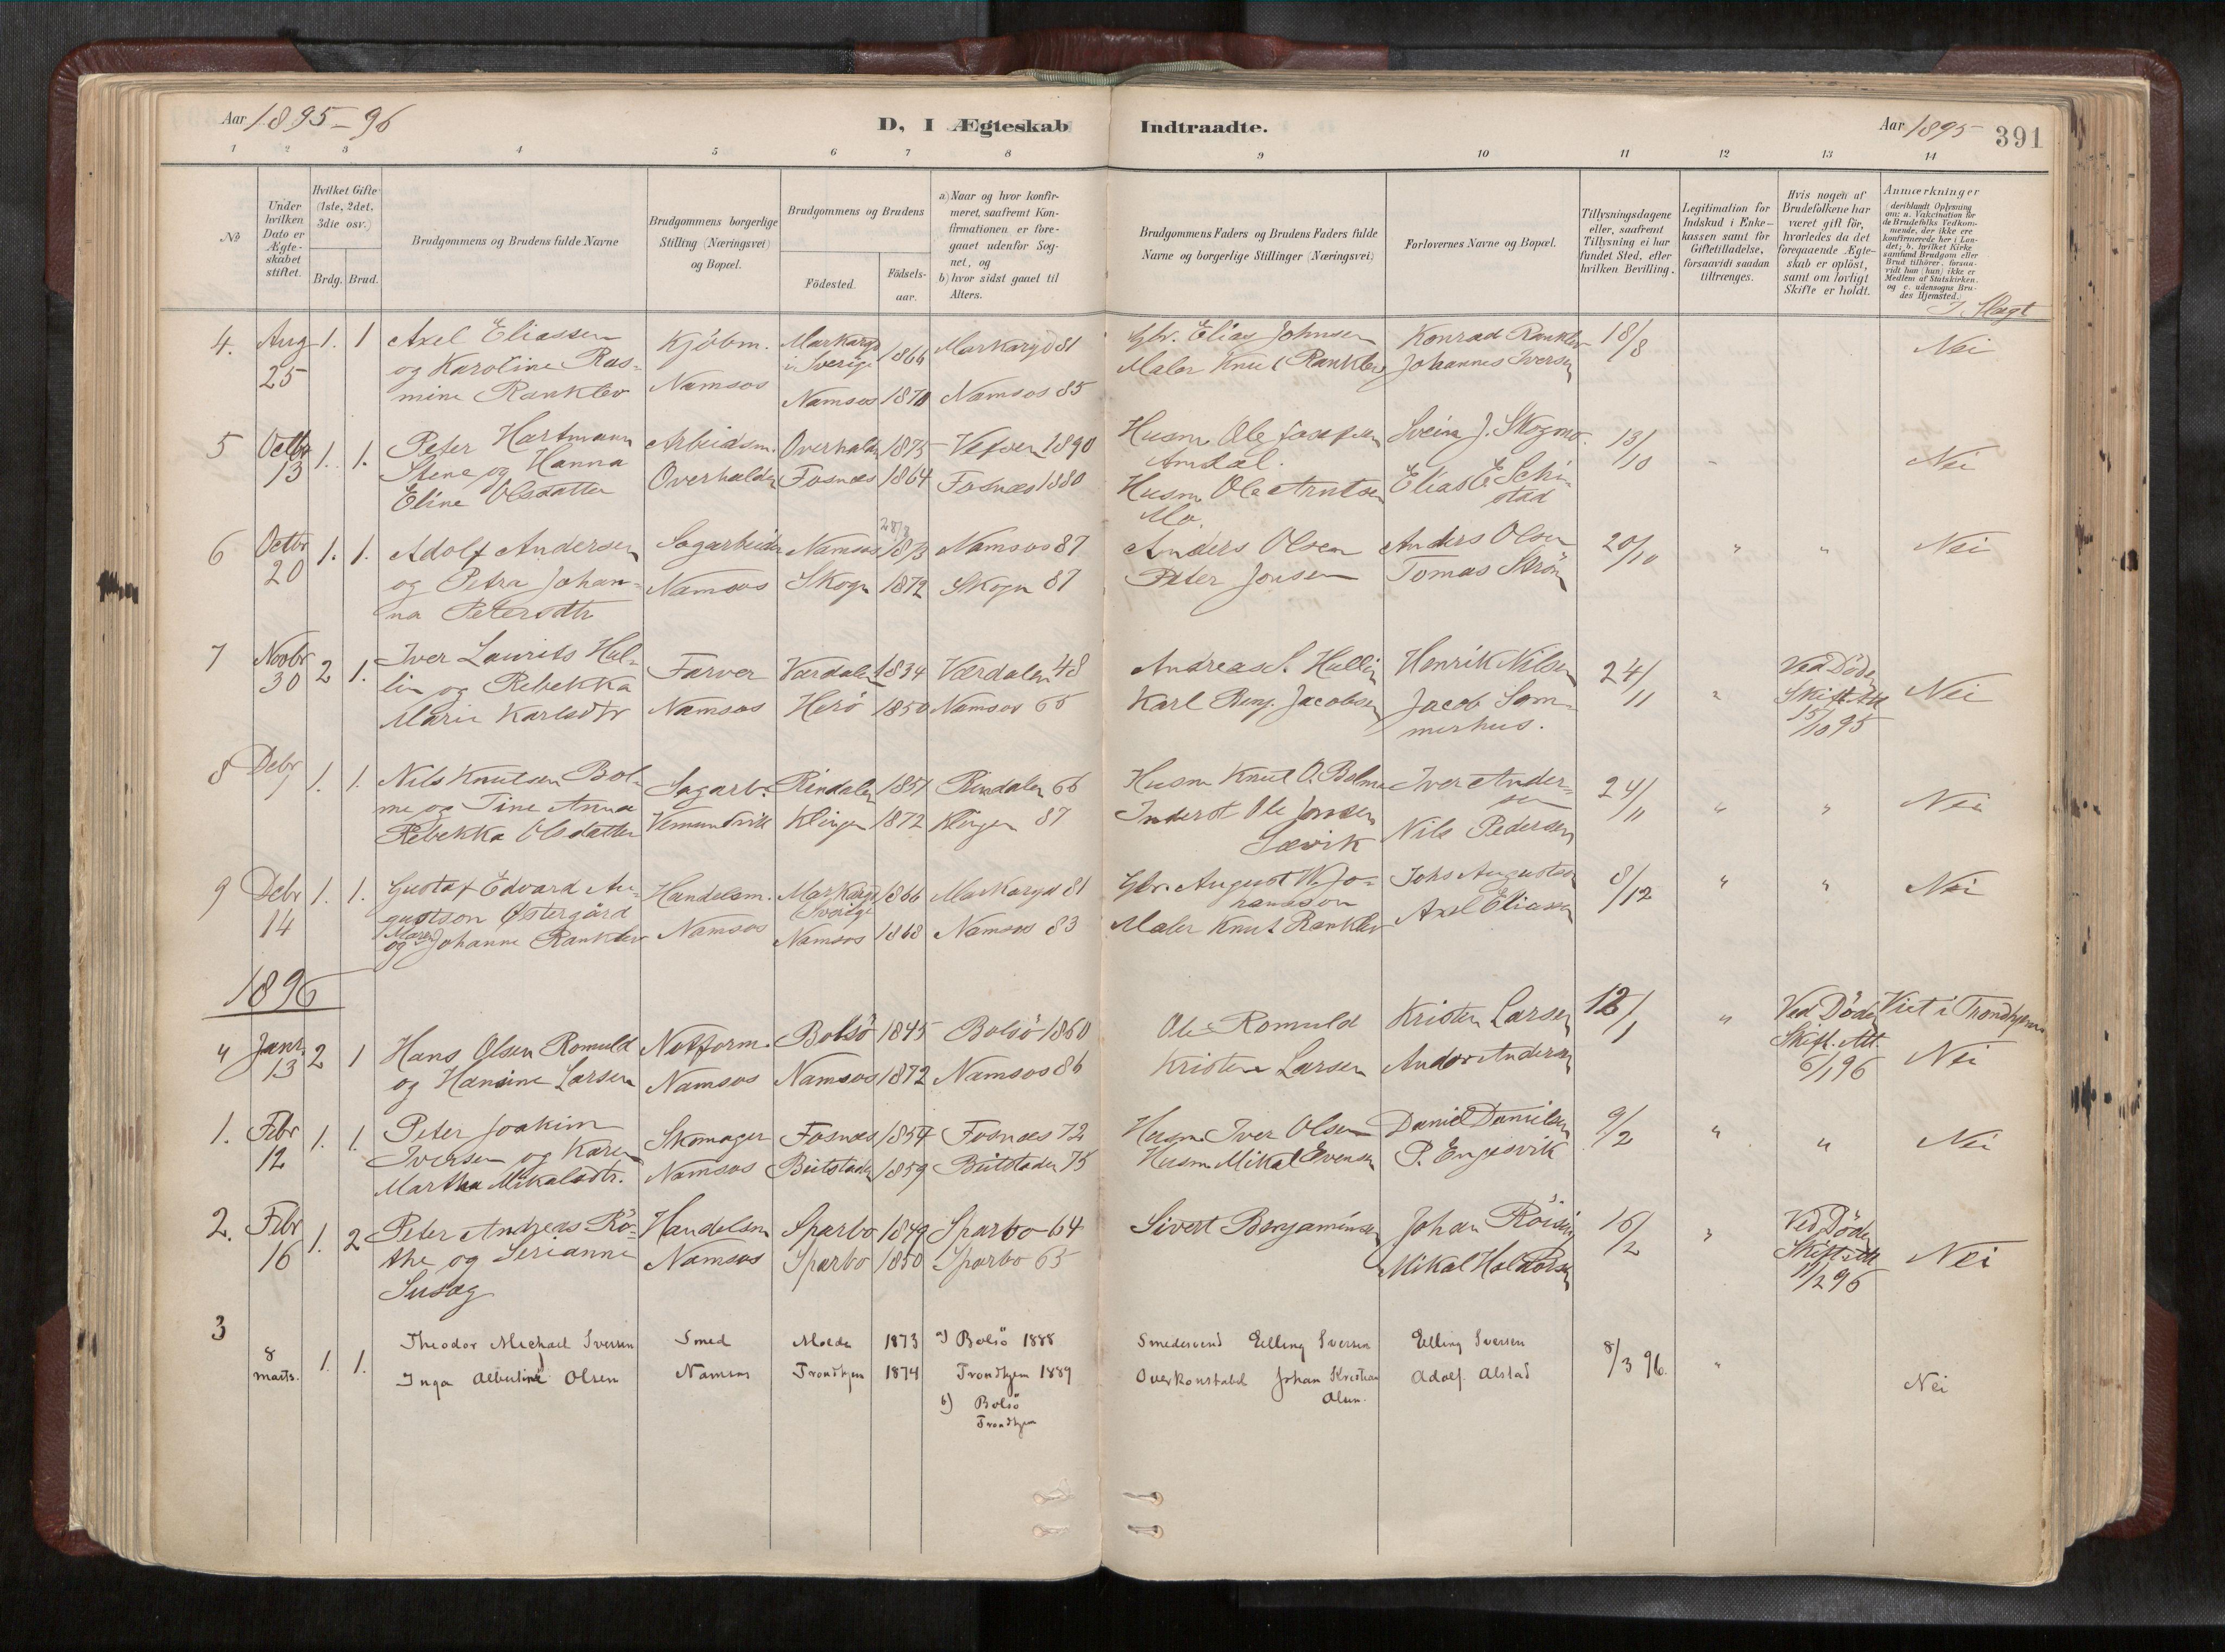 SAT, Ministerialprotokoller, klokkerbøker og fødselsregistre - Nord-Trøndelag, 768/L0579a: Ministerialbok nr. 768A14, 1887-1931, s. 391